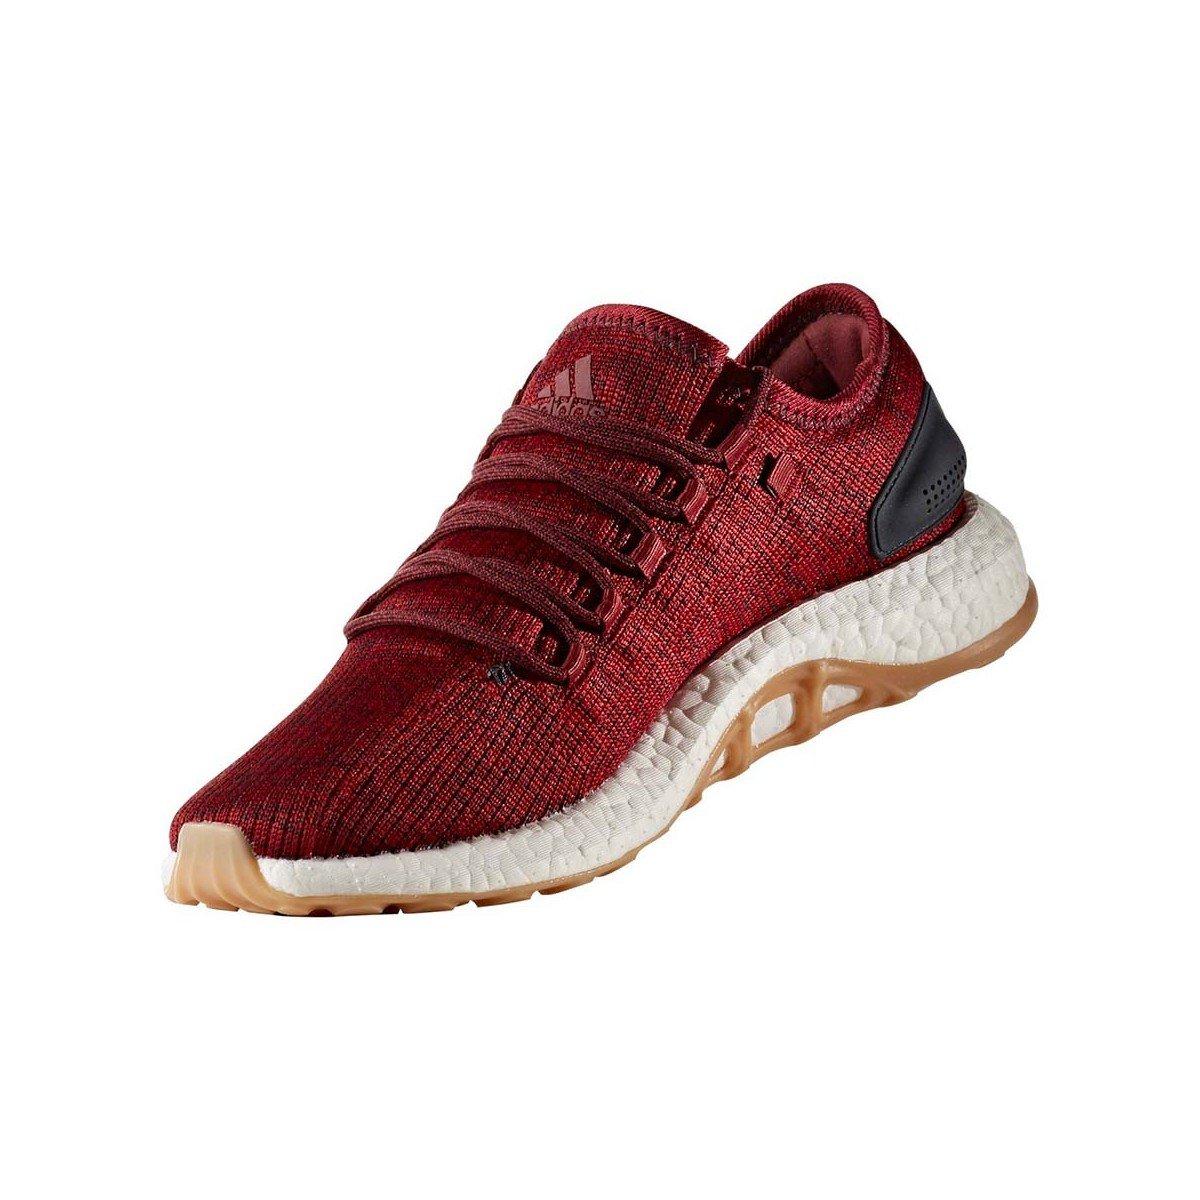 TALLA 40 2/3 EU. adidas Pureboost, Zapatillas de Running para Hombre